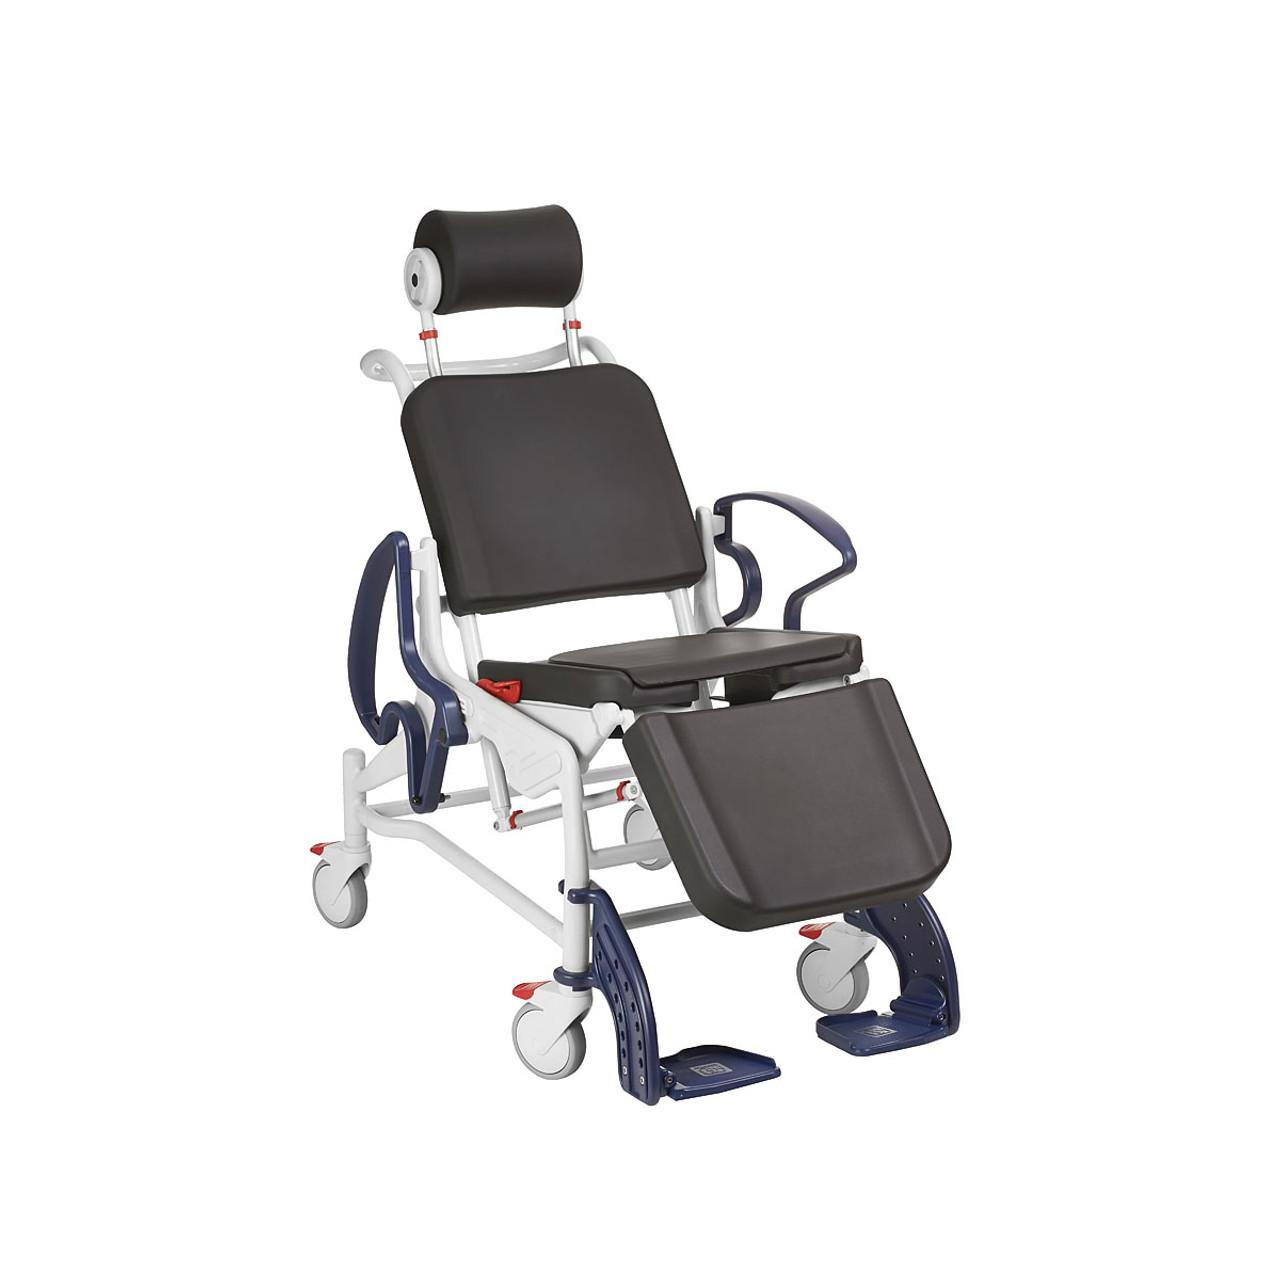 Rebotec Phoenix Tilt In Place Comfort Shower Commode Chair